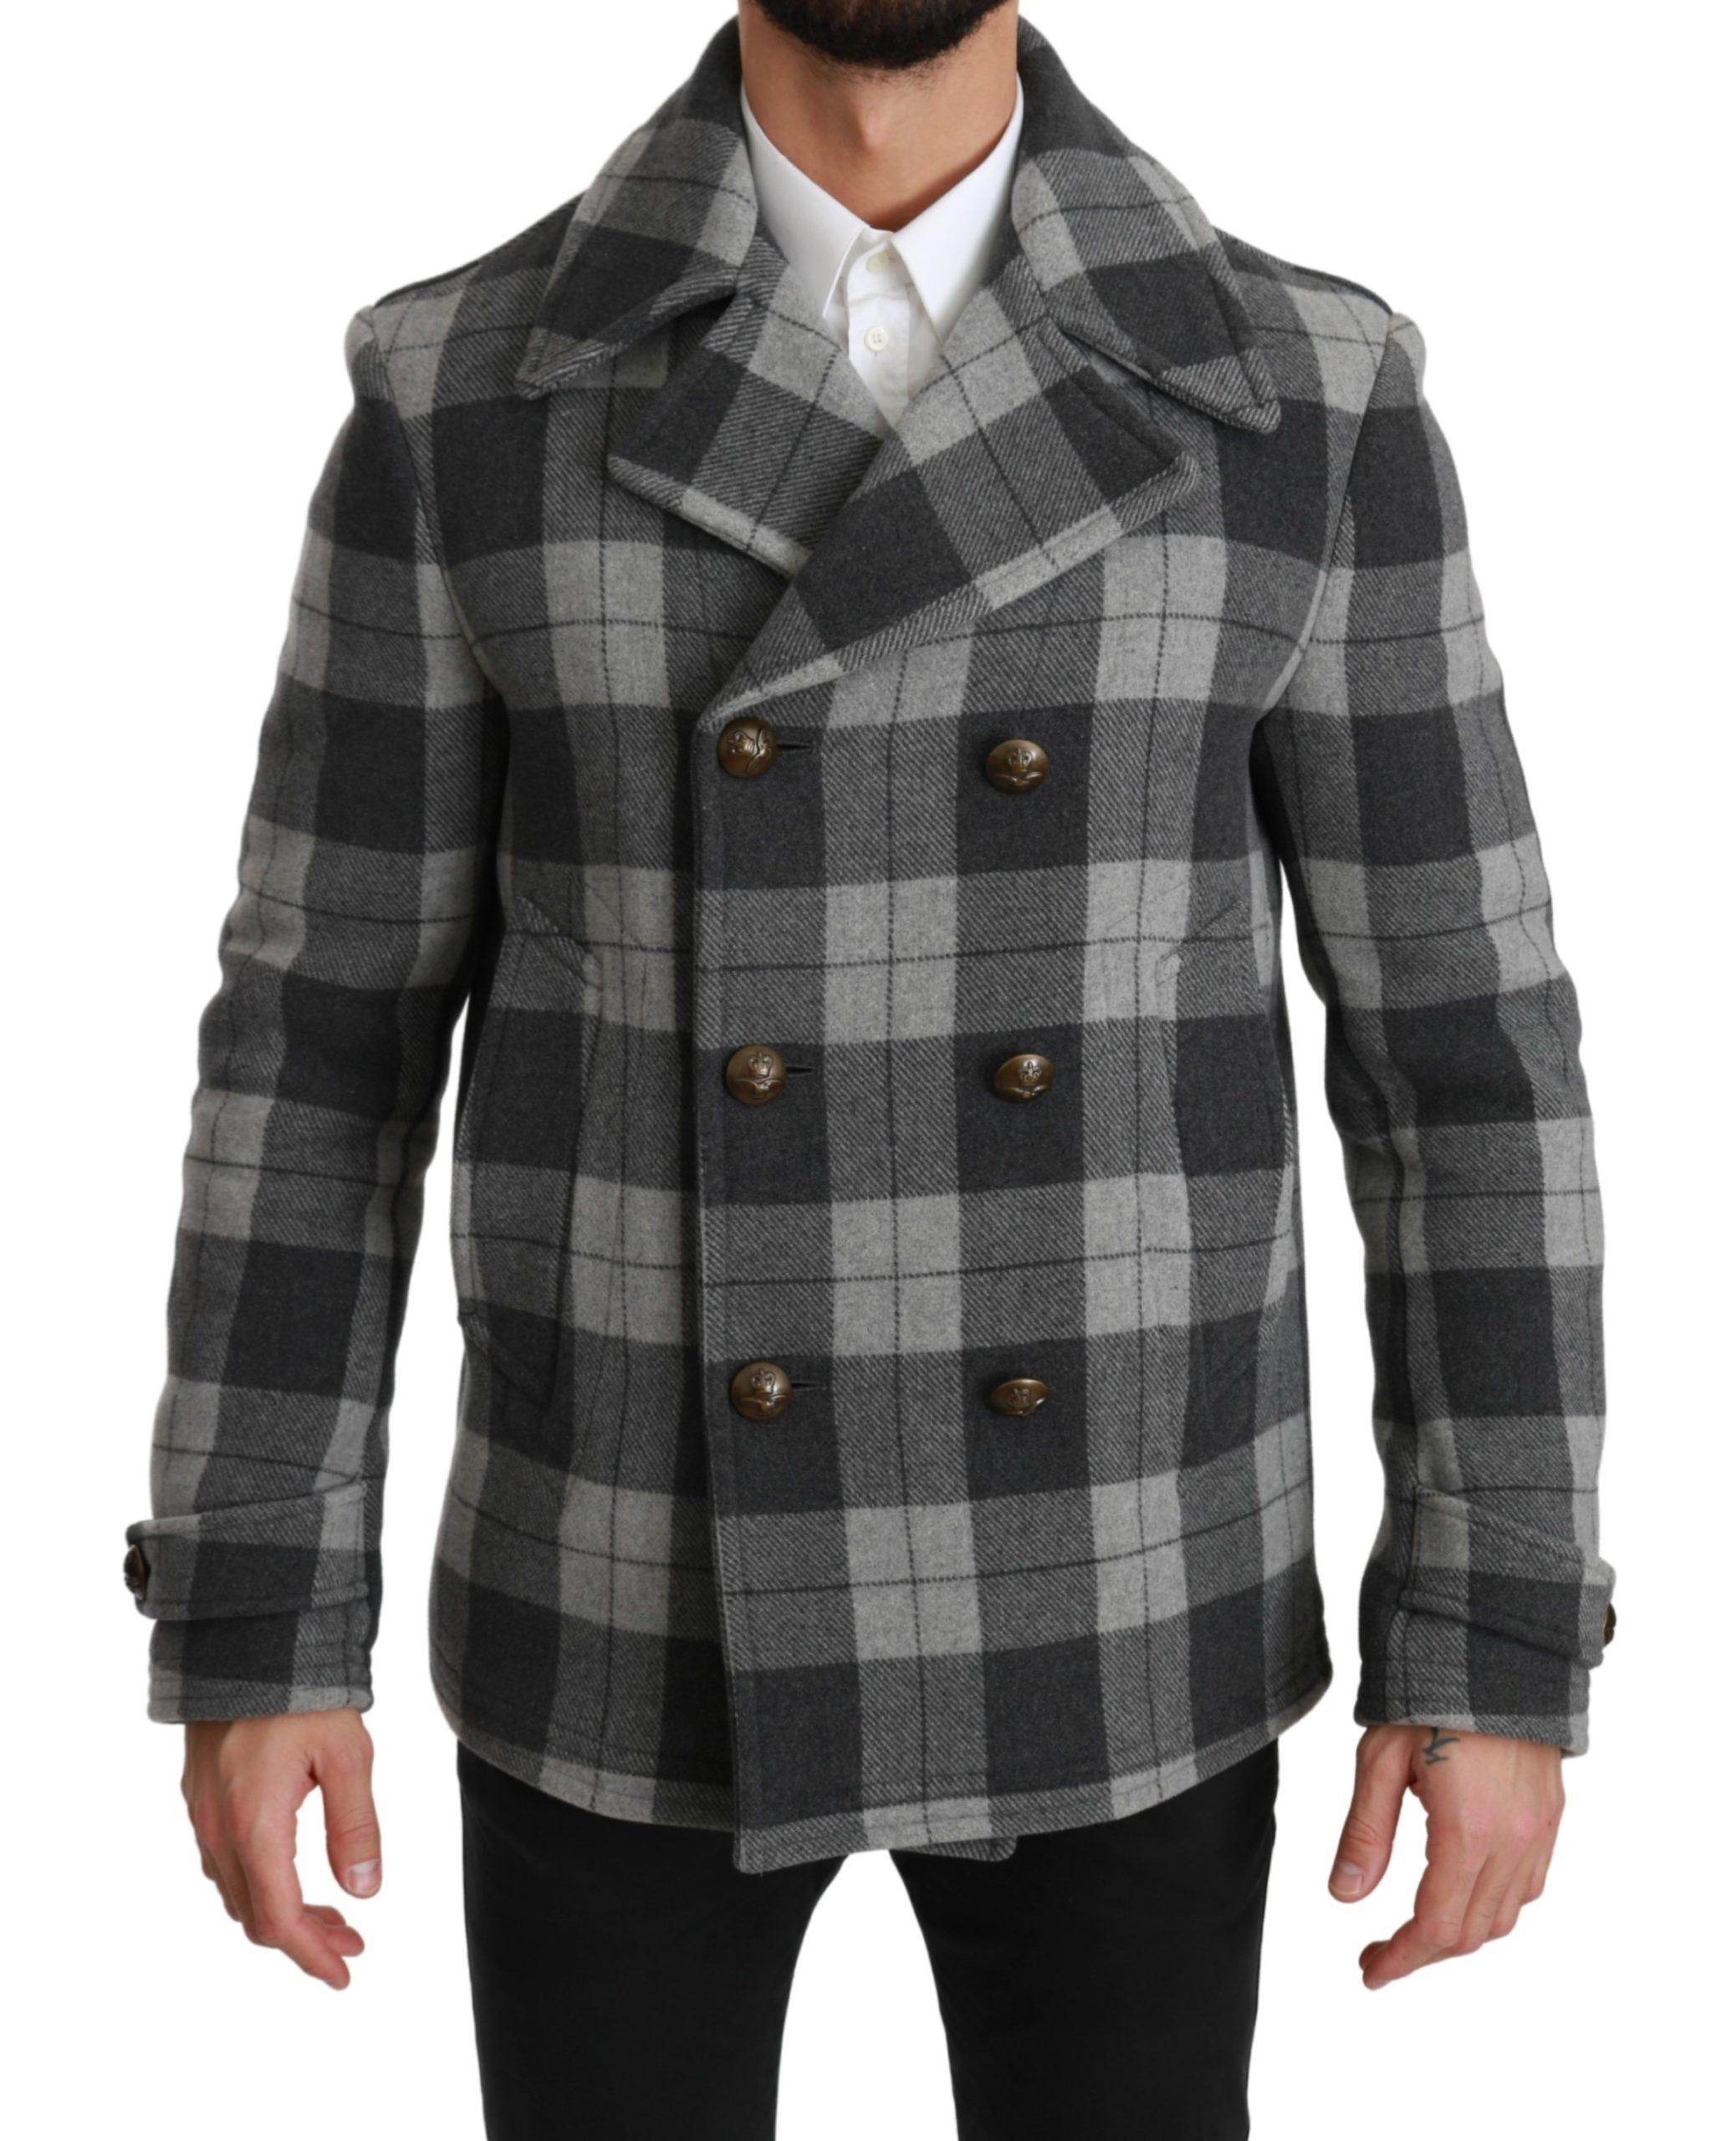 Dolce & Gabbana Men's Check Wool Cashmere Jacket Gray JKT2531 - IT44 | XS